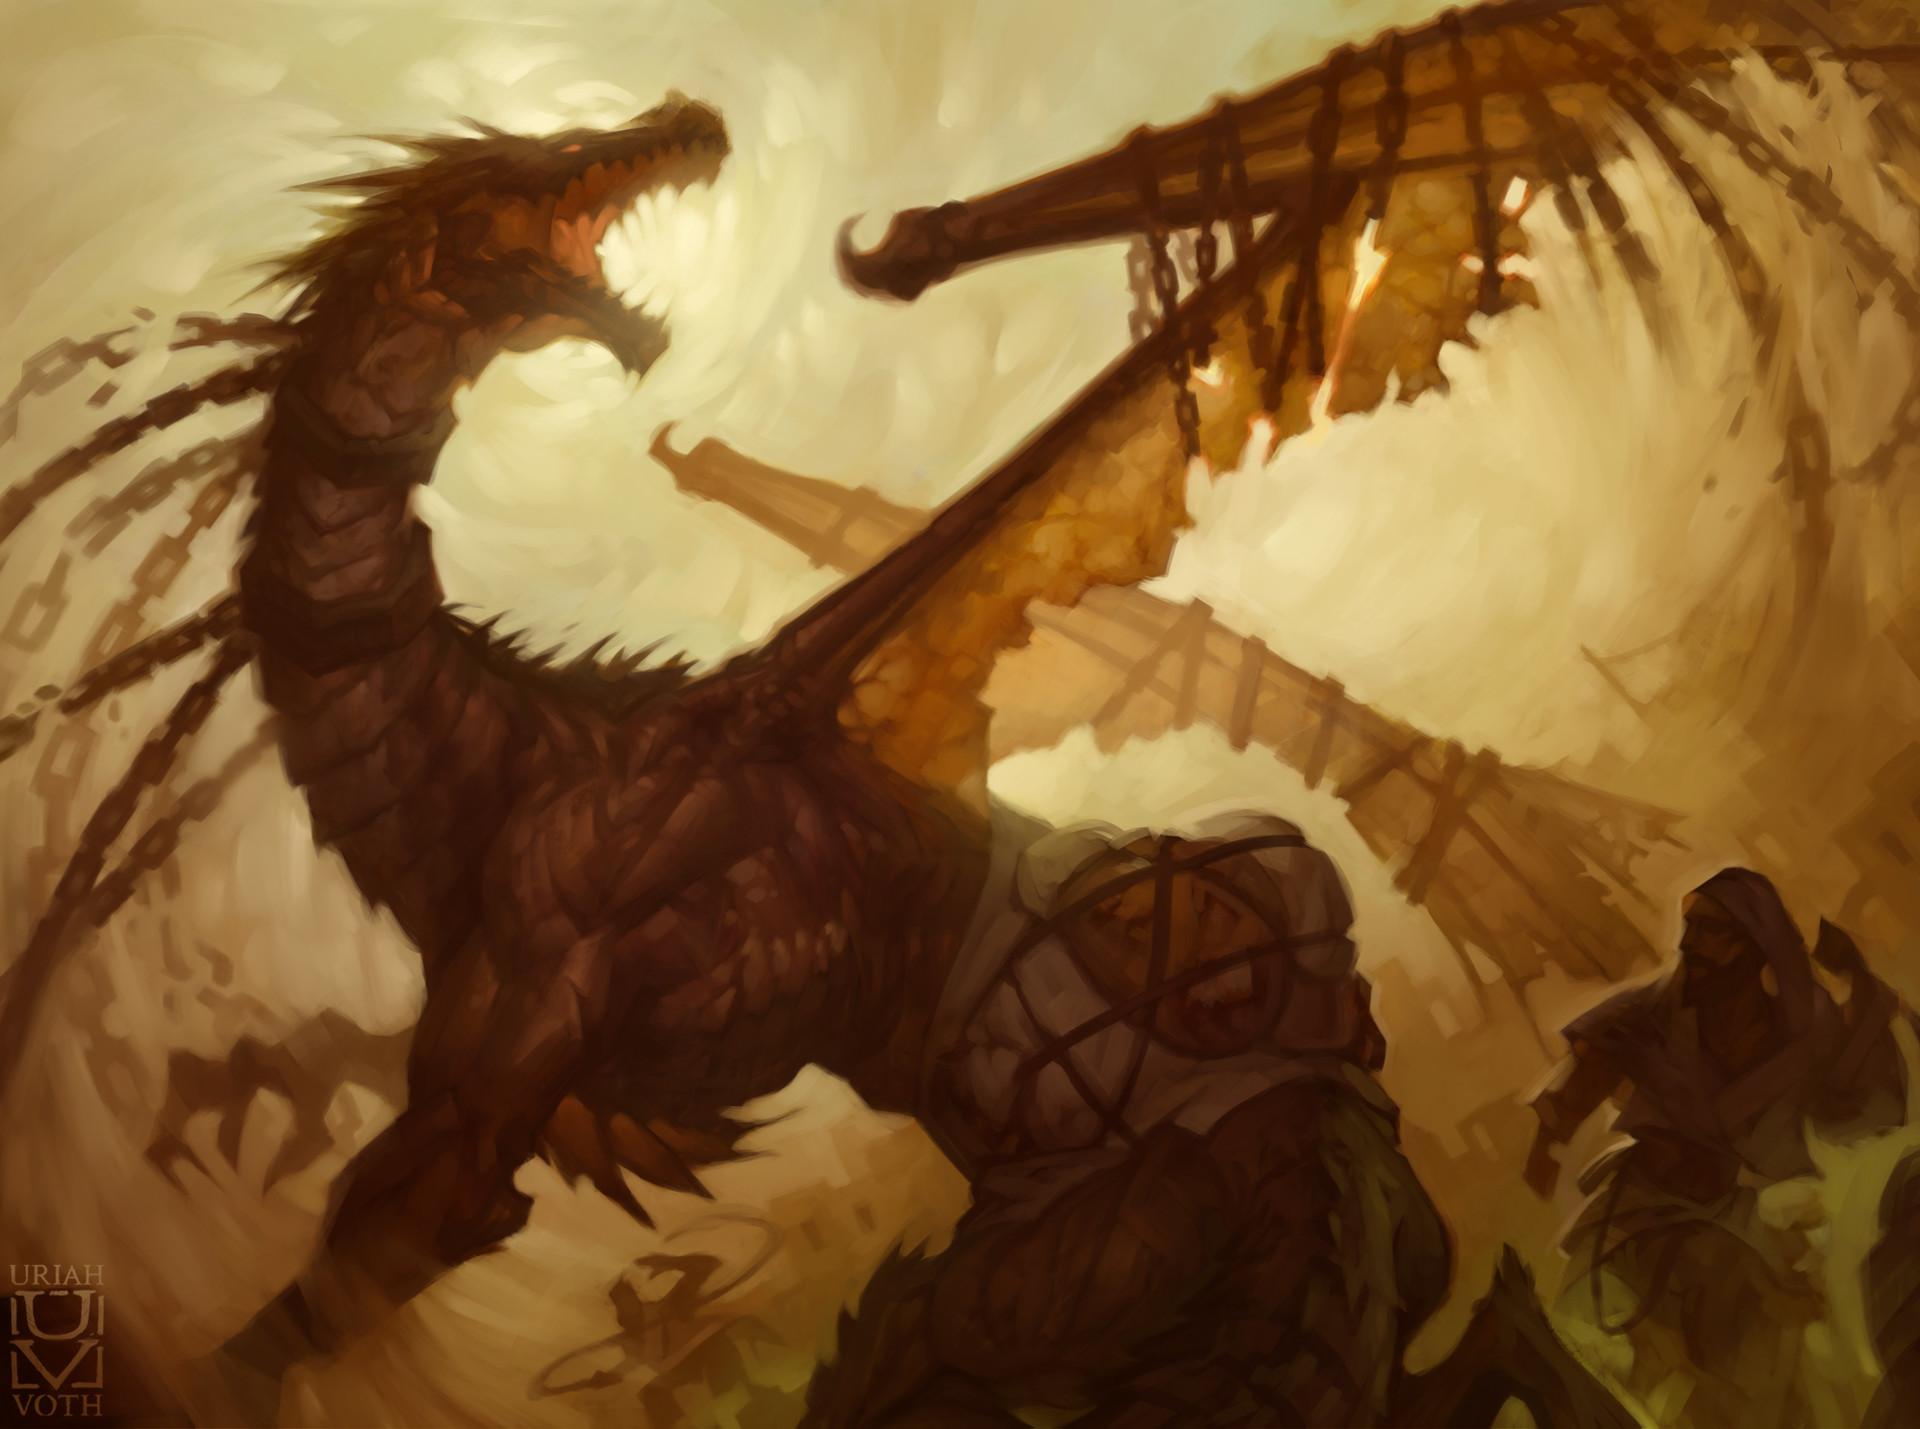 Enslaved Dragon by Uriah Voth 1